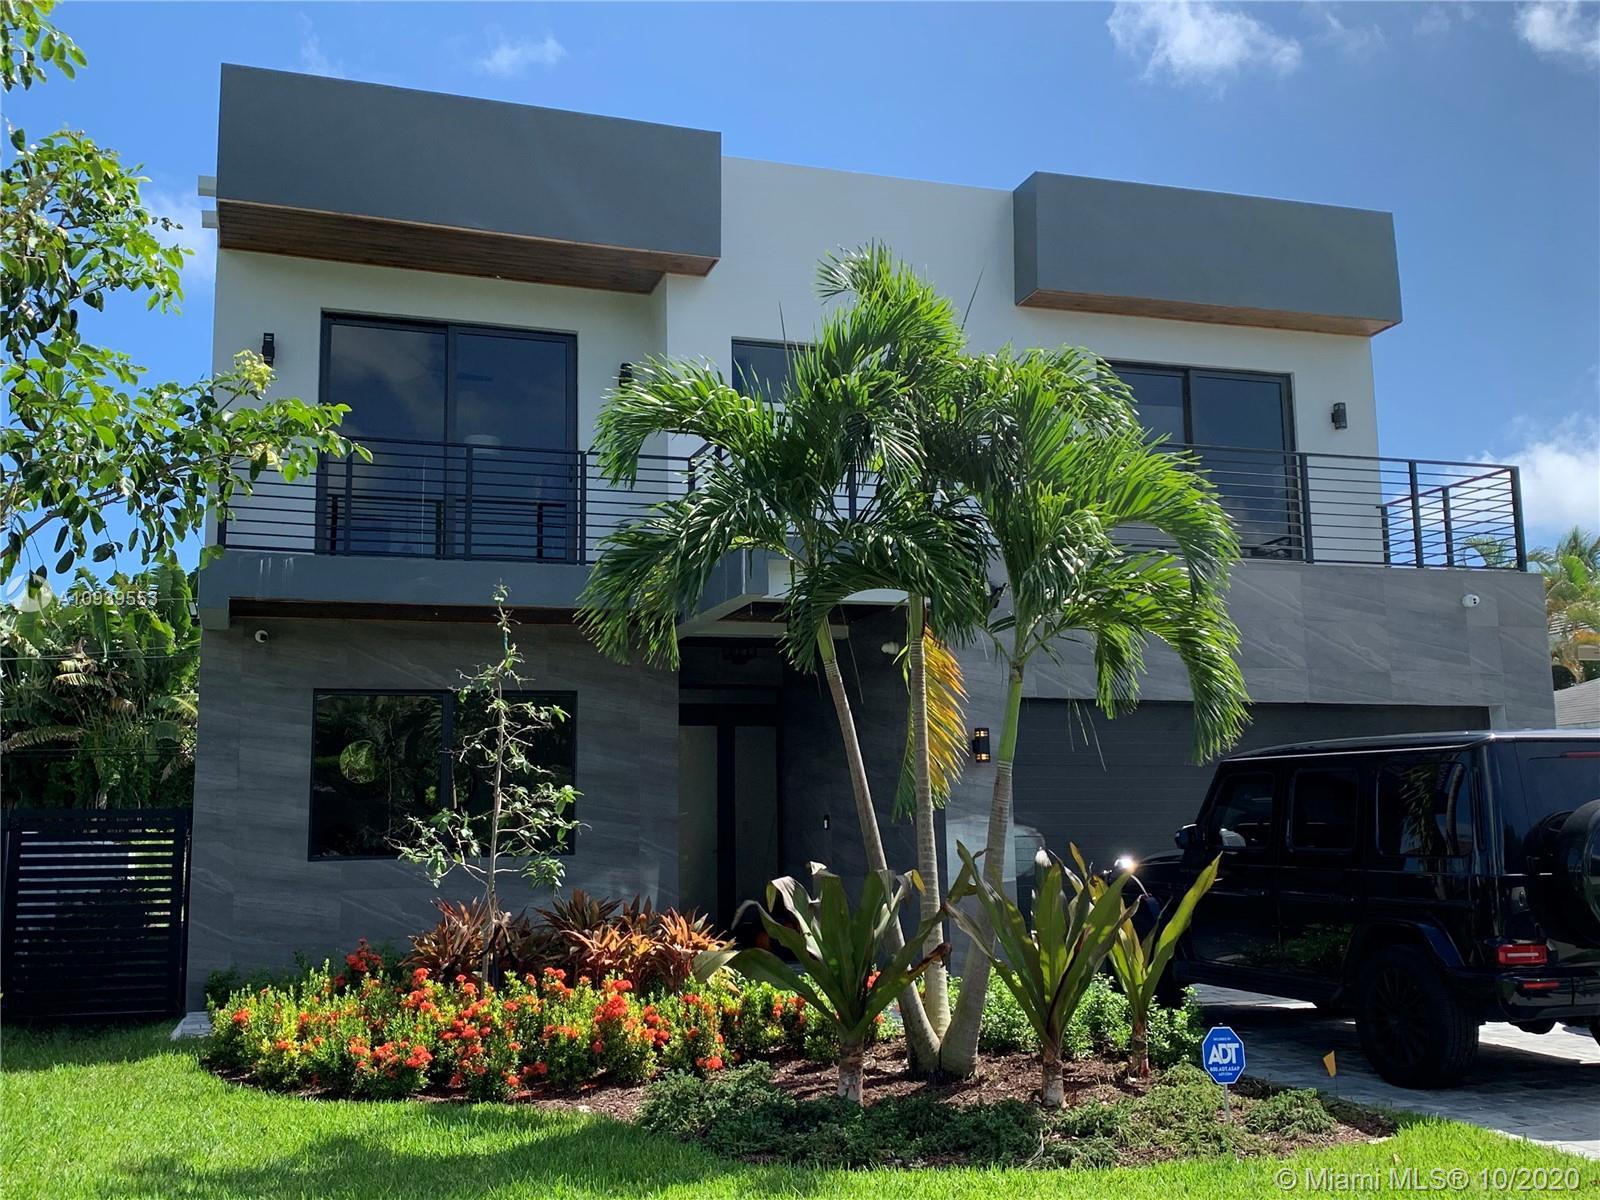 Middle River Park, 409 NE 17th Ave, Fort Lauderdale, Florida 33301